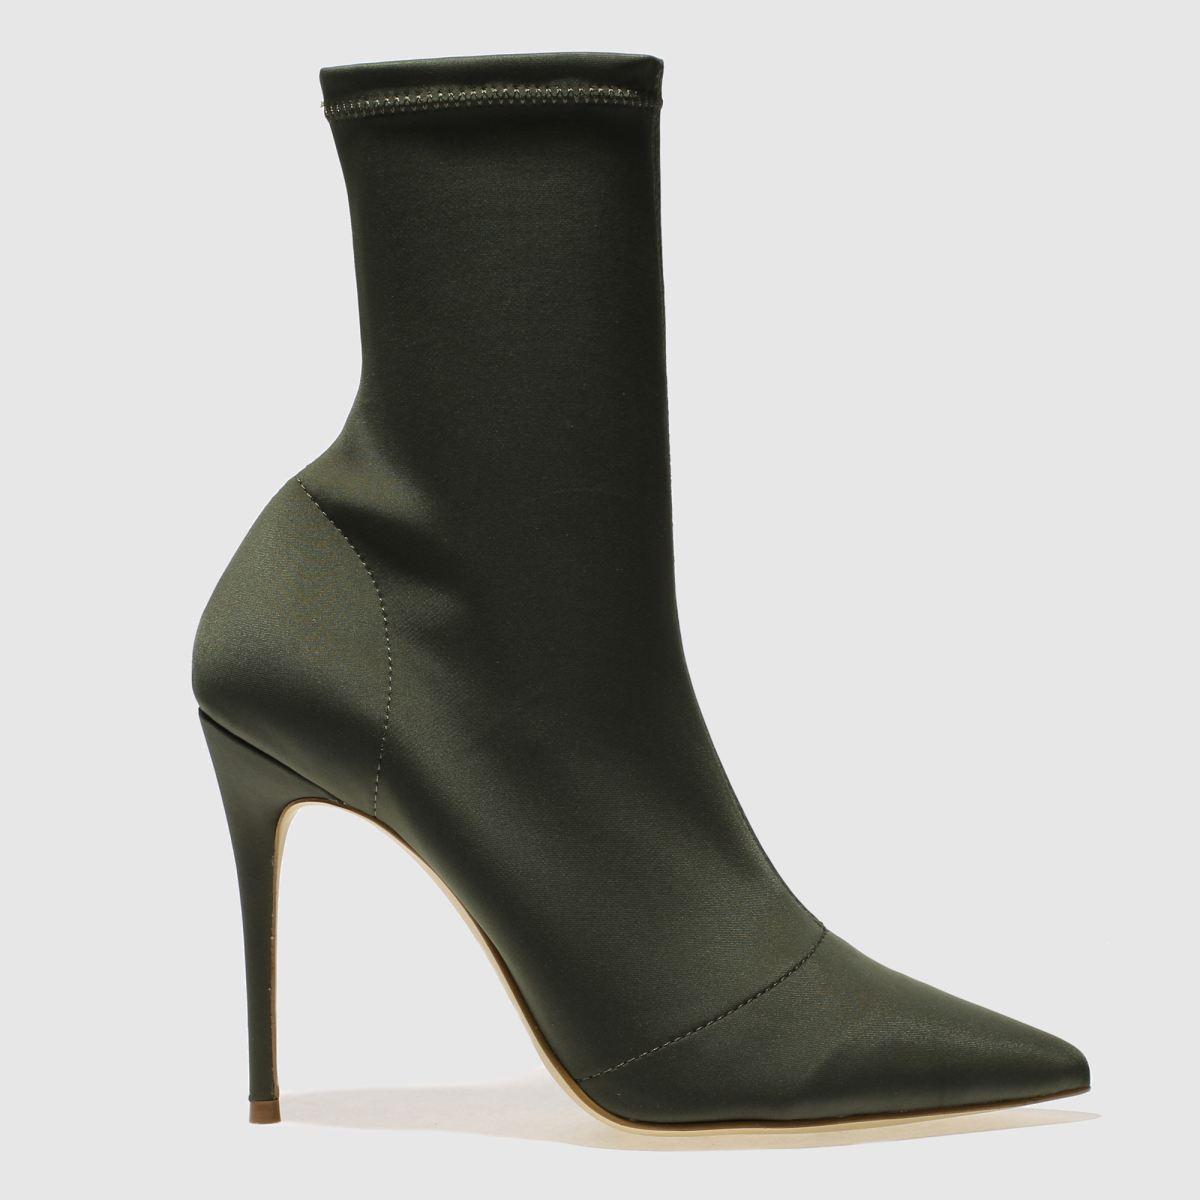 Schuh Khaki Vibes Boots